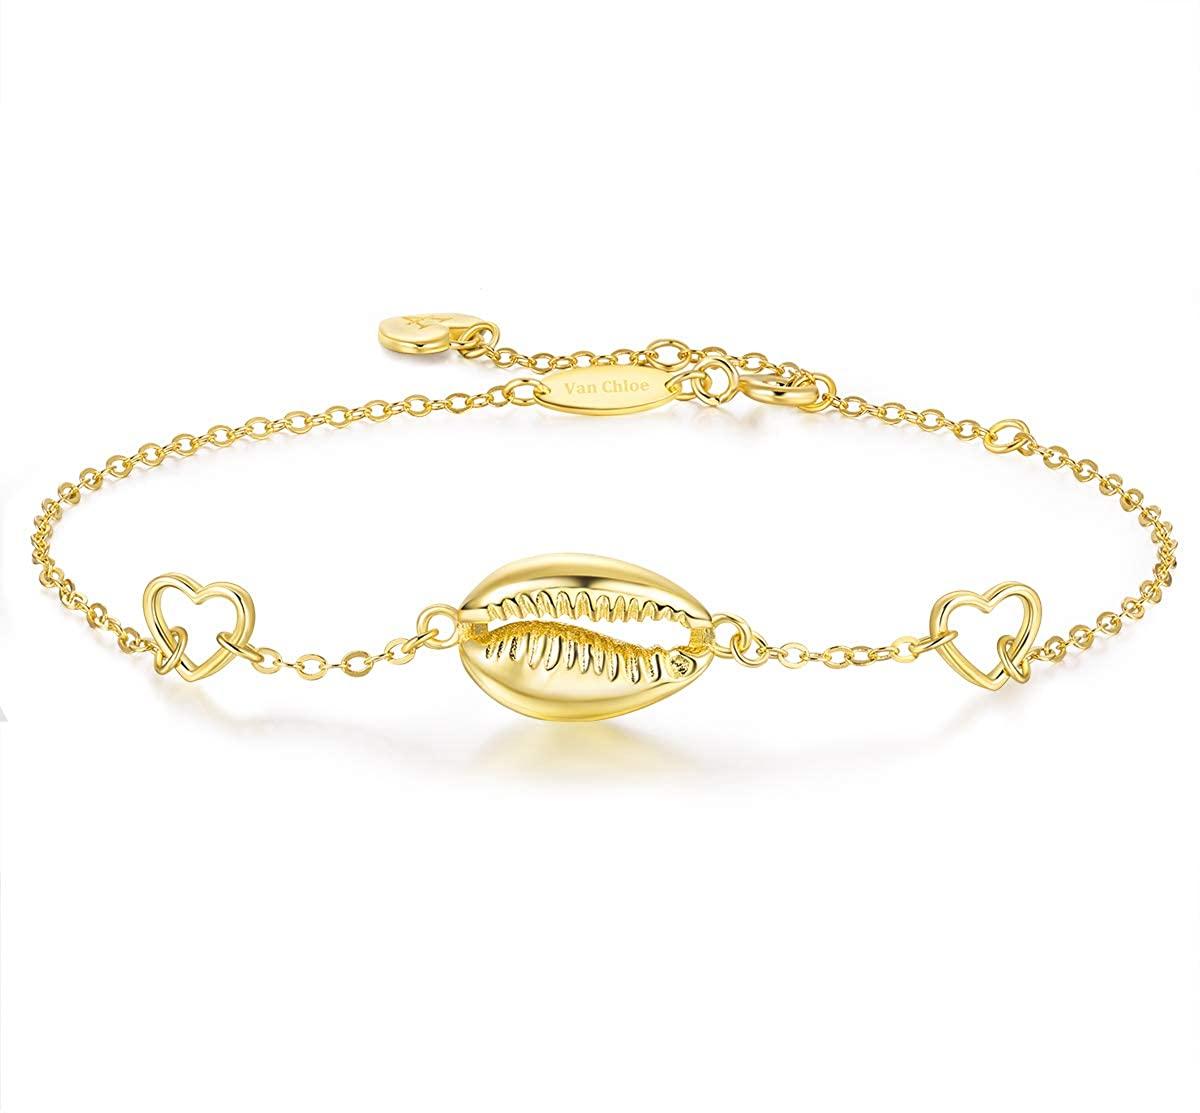 Van Chloe 925 Sterling Silver Shell Bracelet Boho Seashell Adjustable Bracelet Jewelry Gifts for Women Teen Girls Christmas